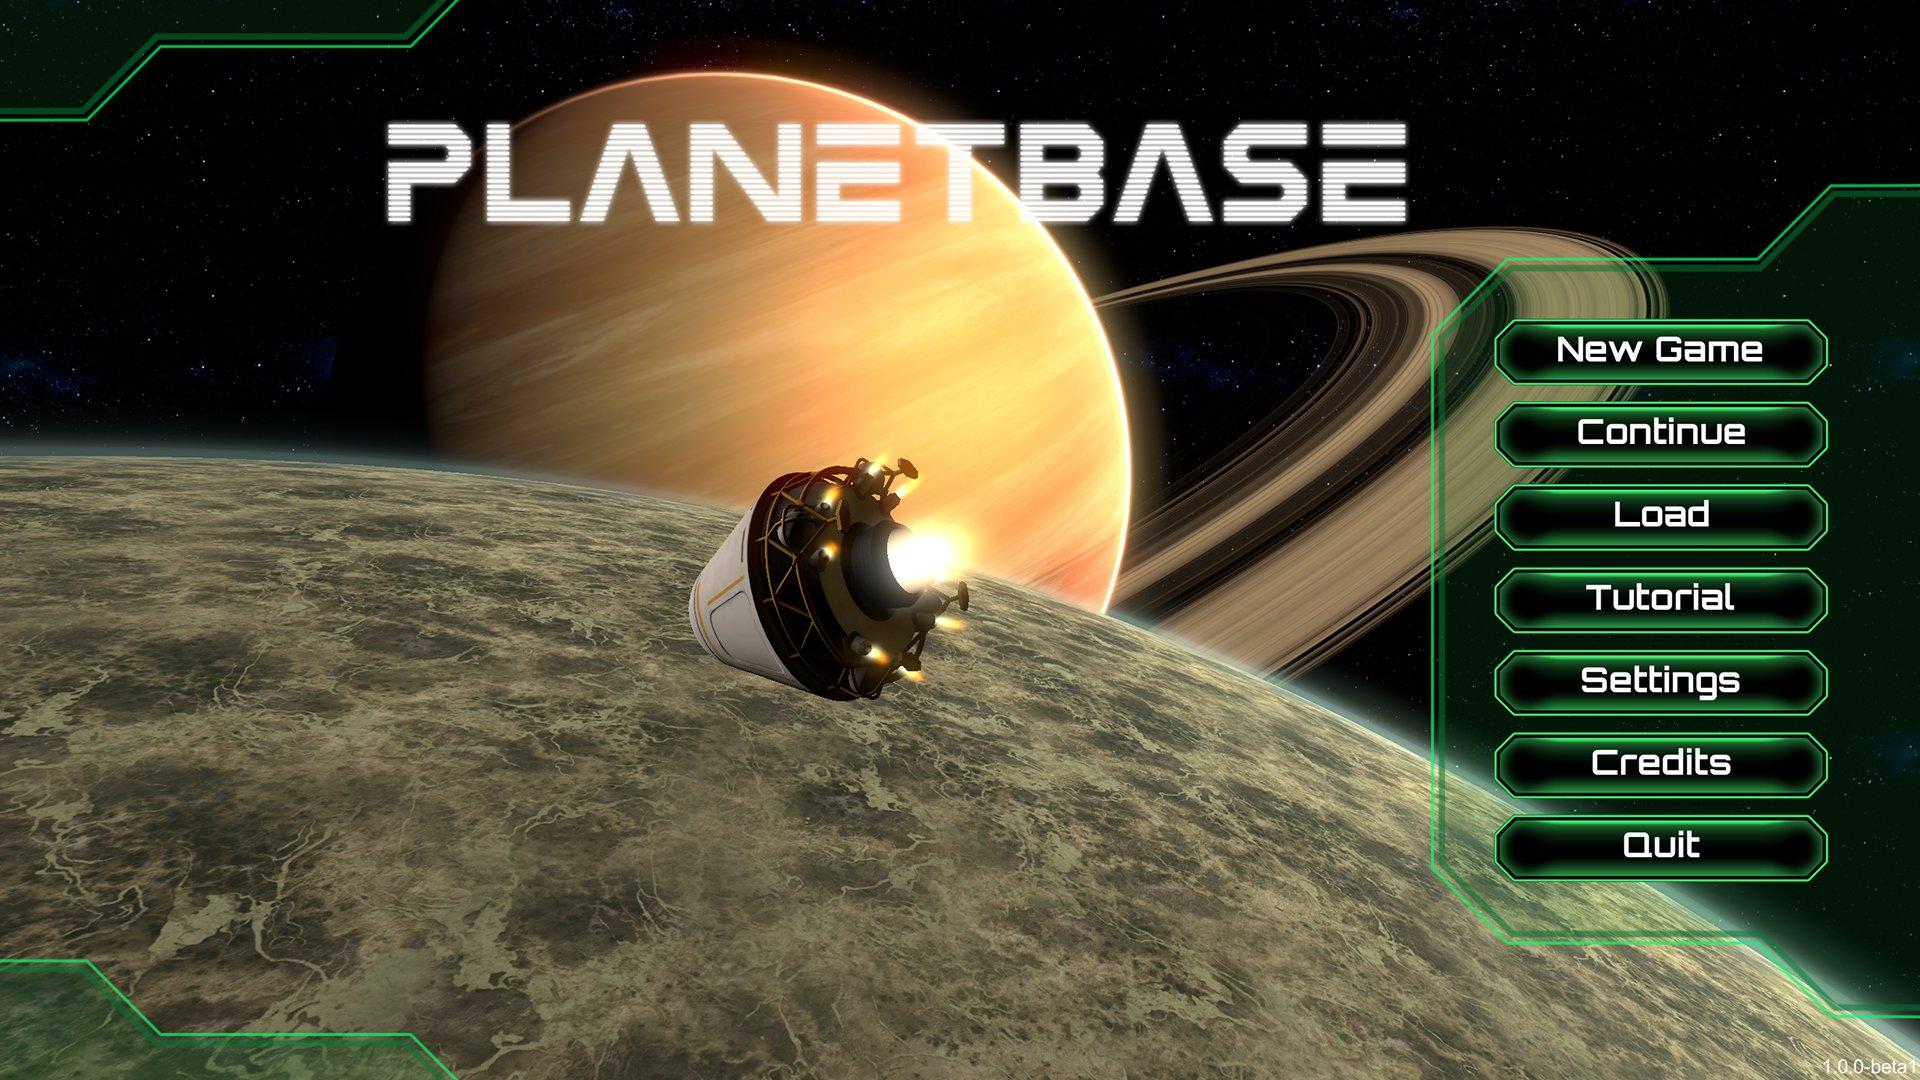 Planetbase 23